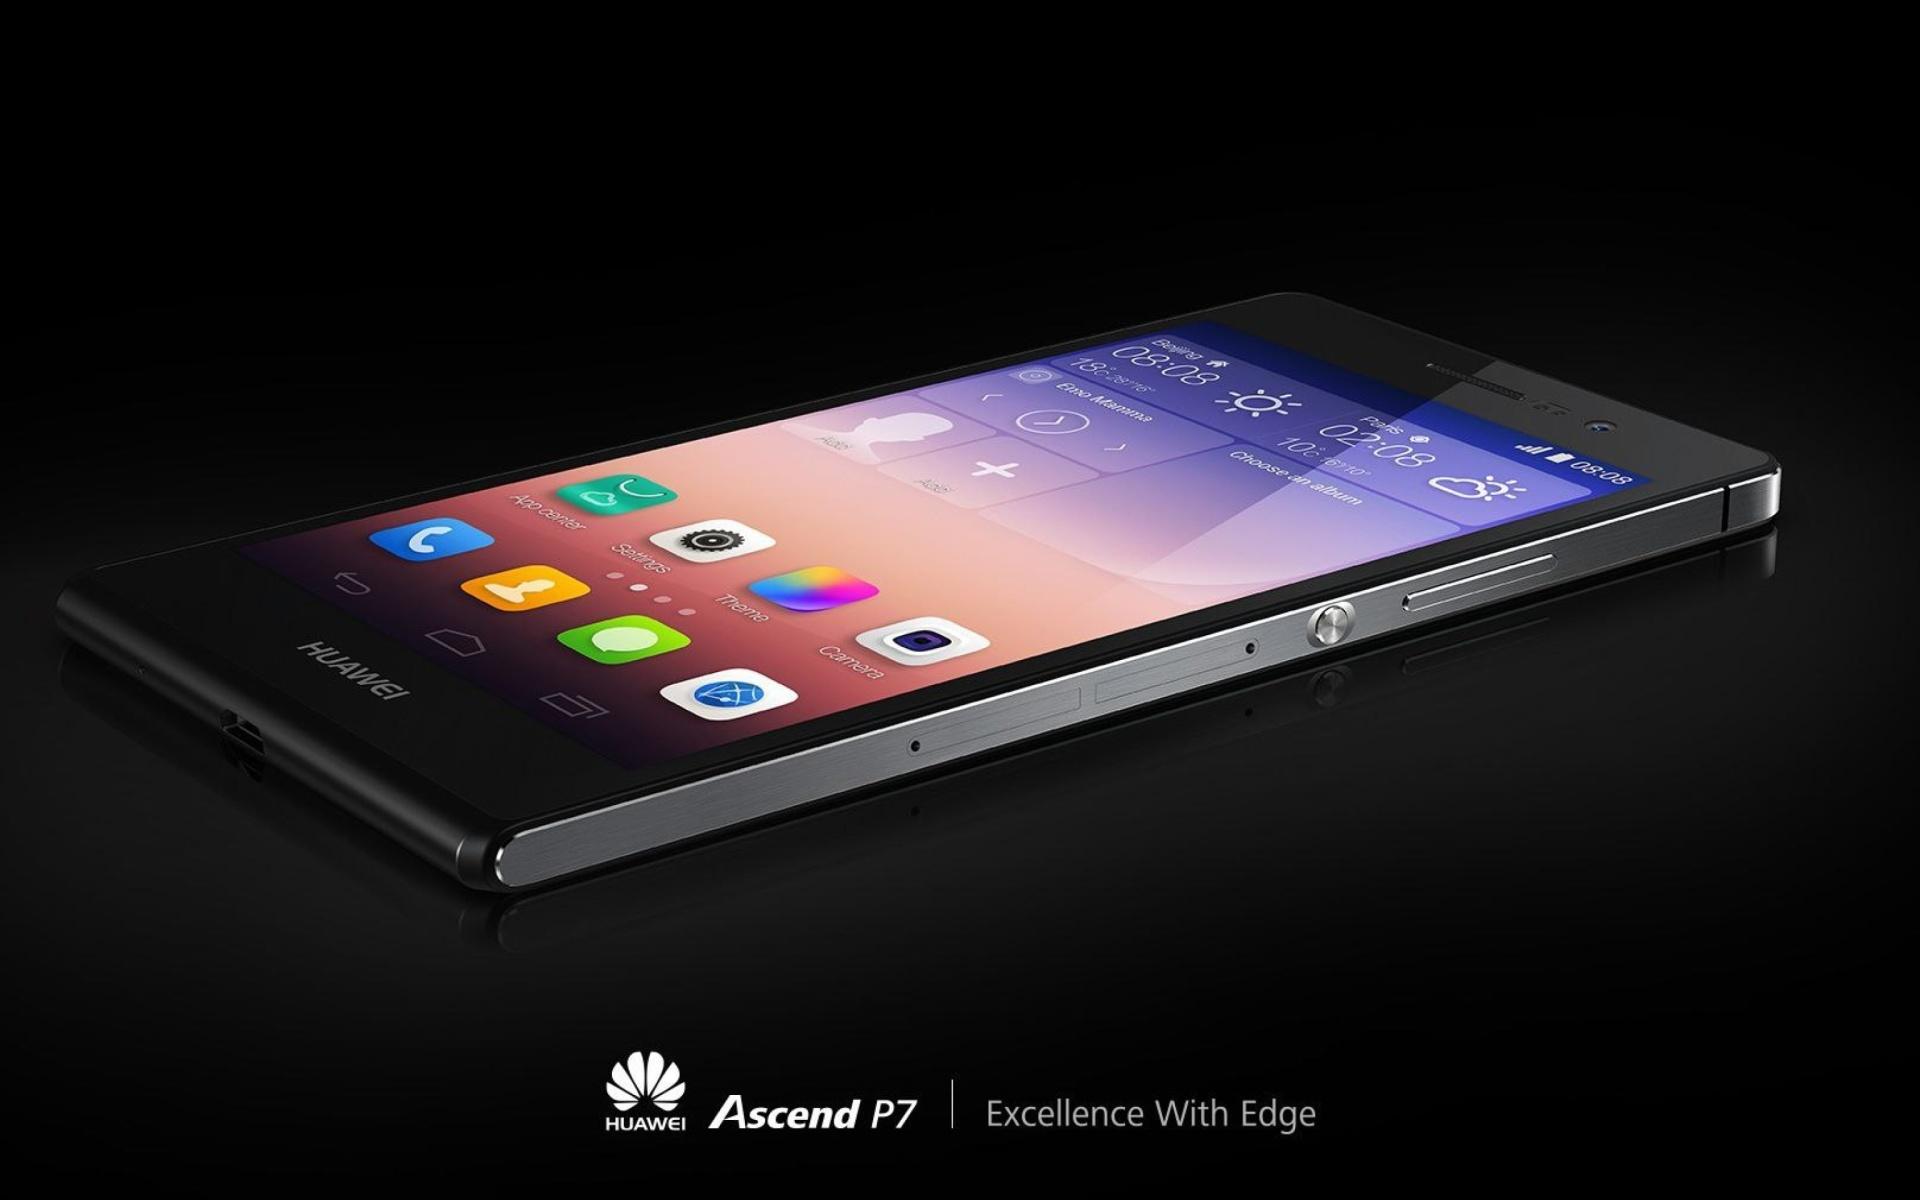 Huawei Ascend Wallpaper: Huawei Ascend P7 Wallpaper For Widescreen Desktop PC